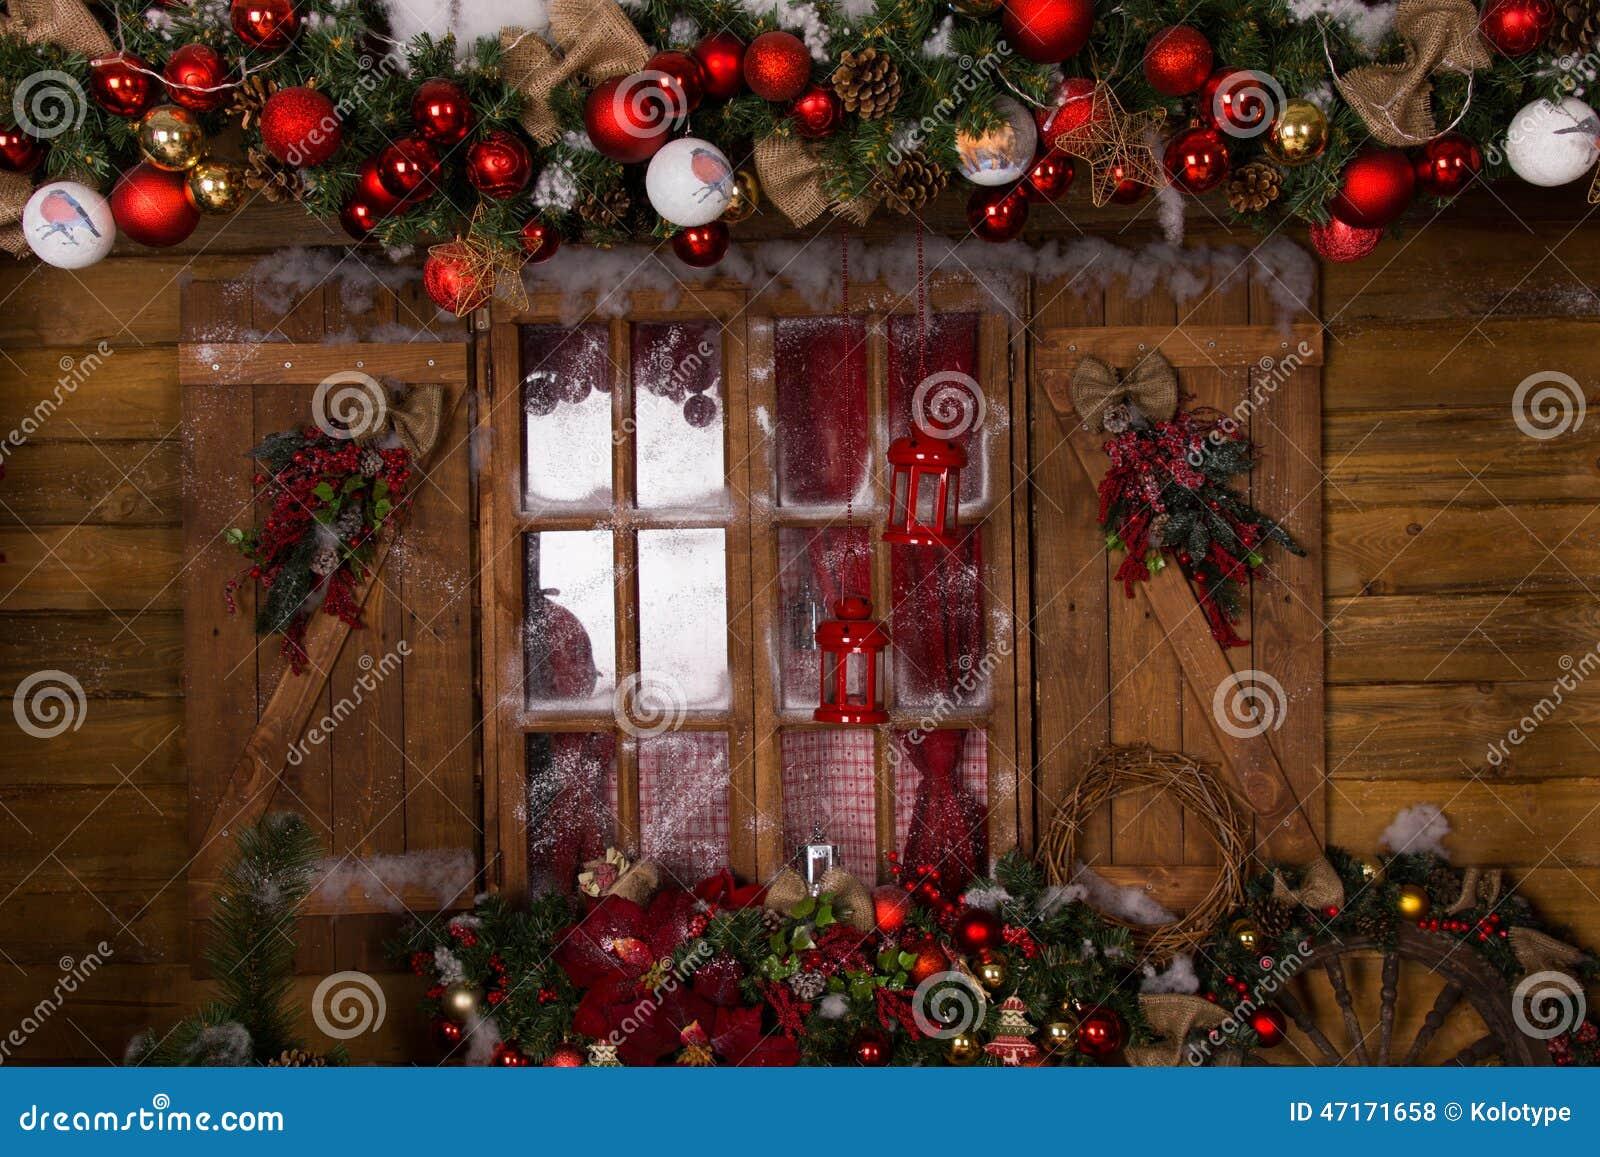 Minature Christmas Trees